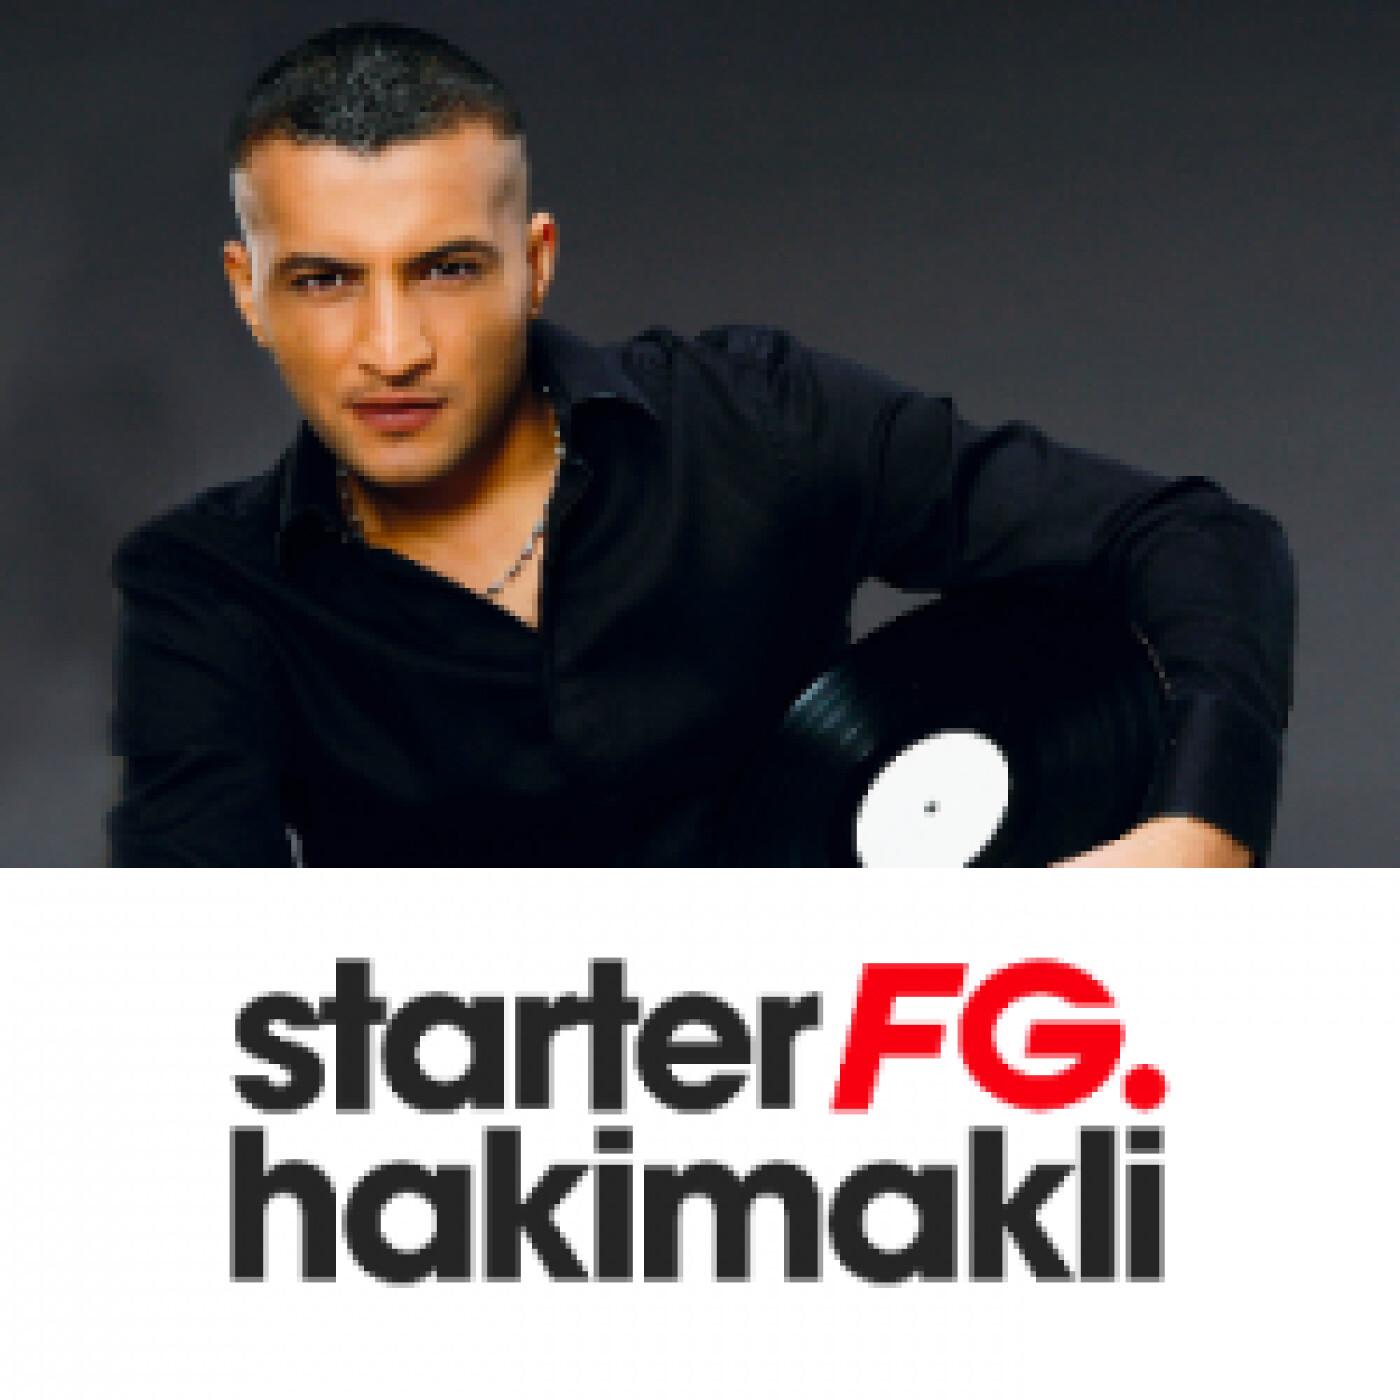 STARTER FG BY HAKIMAKLI MARDI 22 JUIN 2021